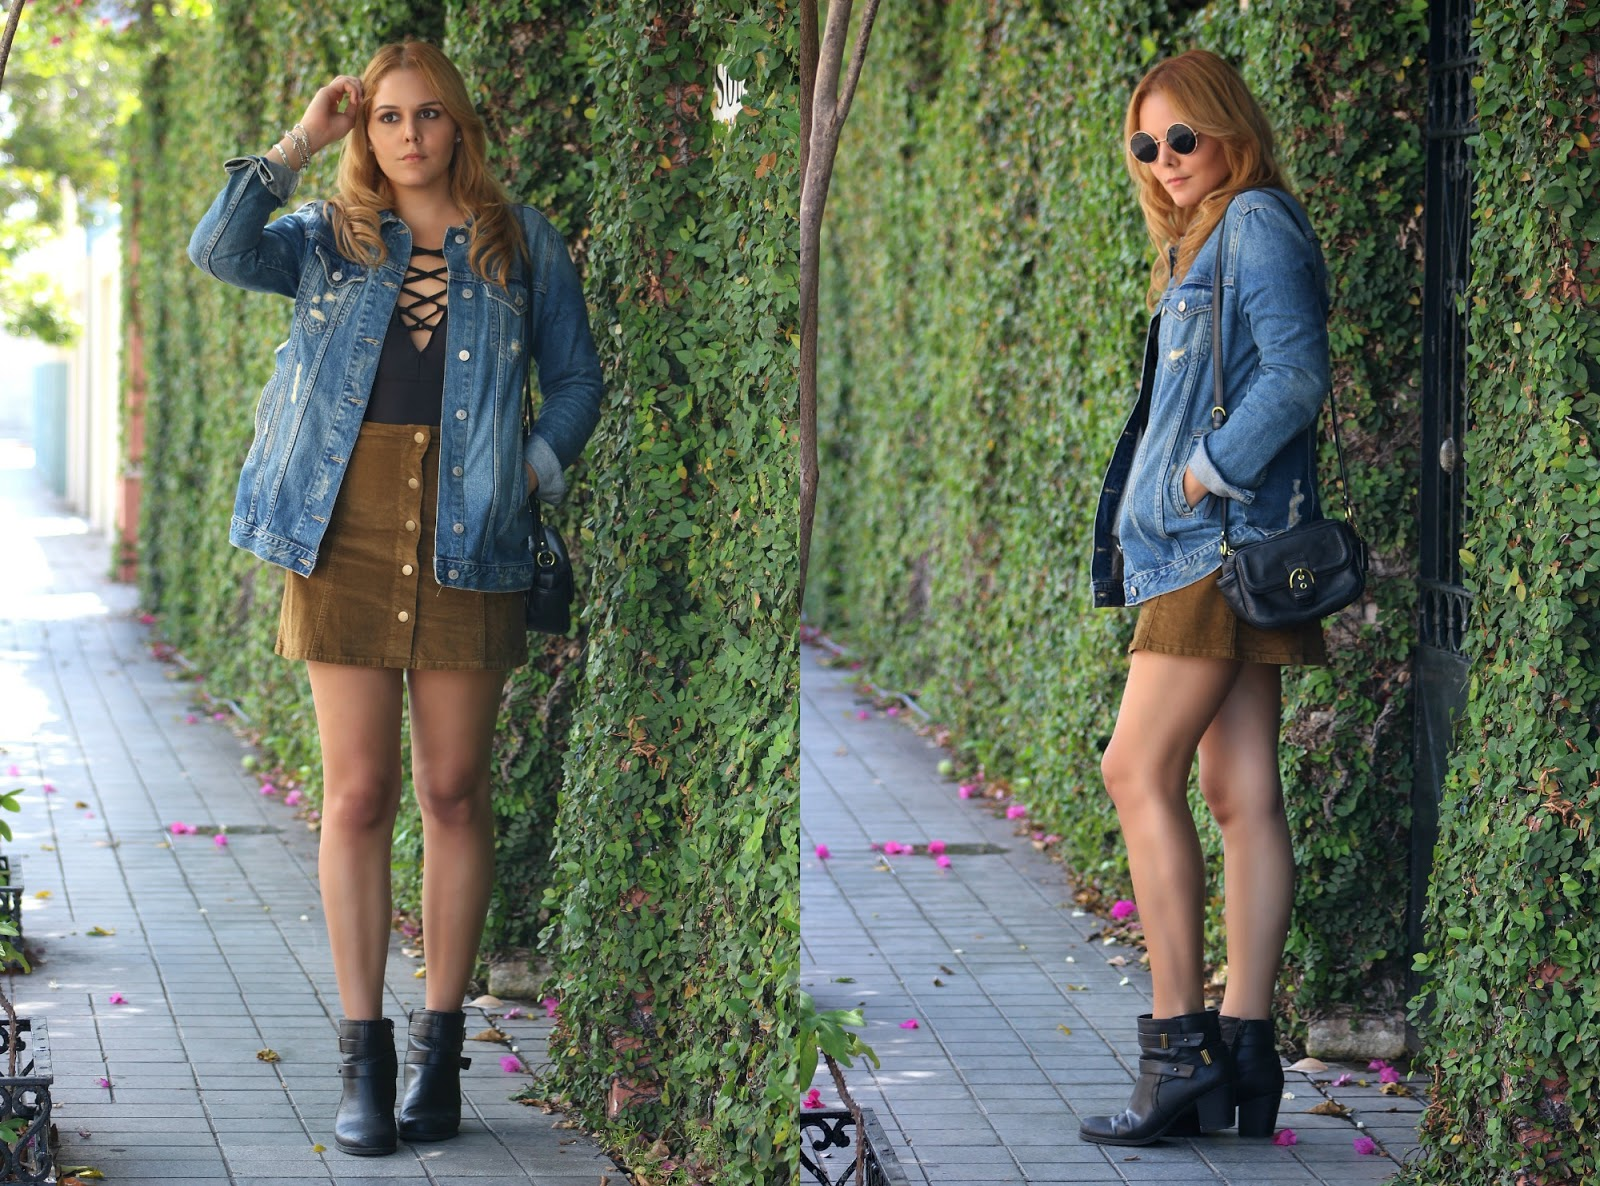 Dazed & Confused | NataliaBosch